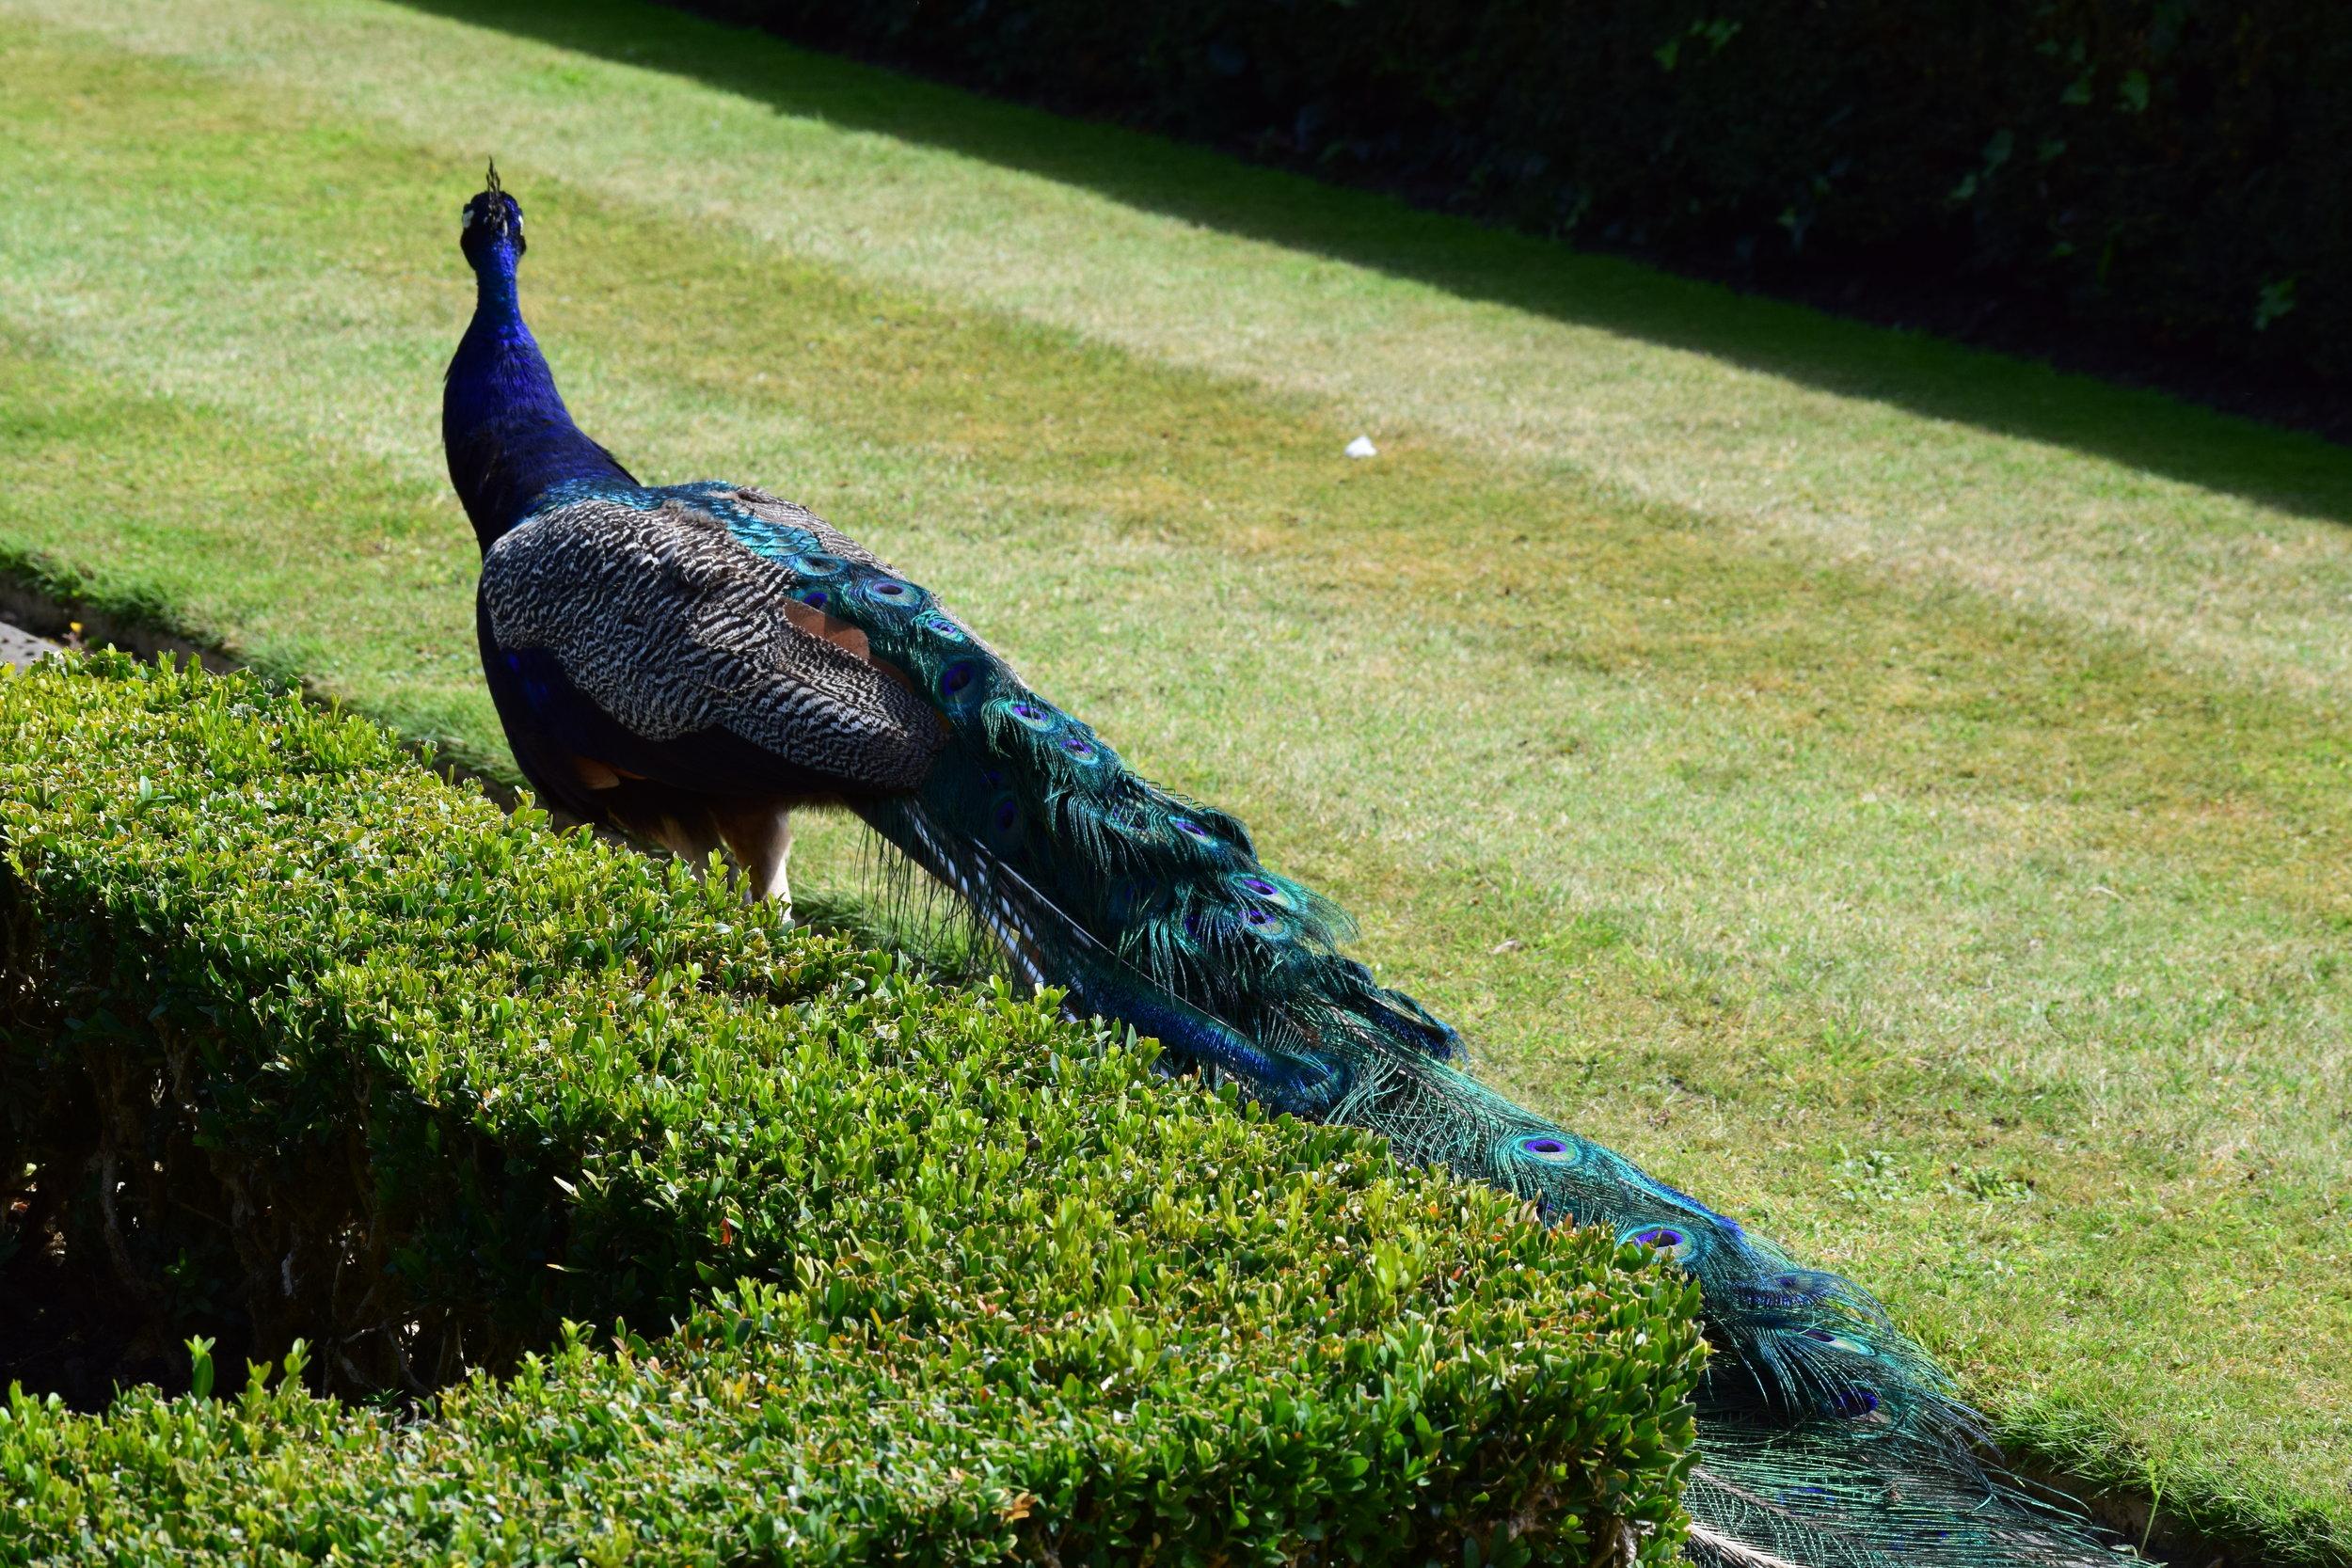 Peacocks in the gardens!